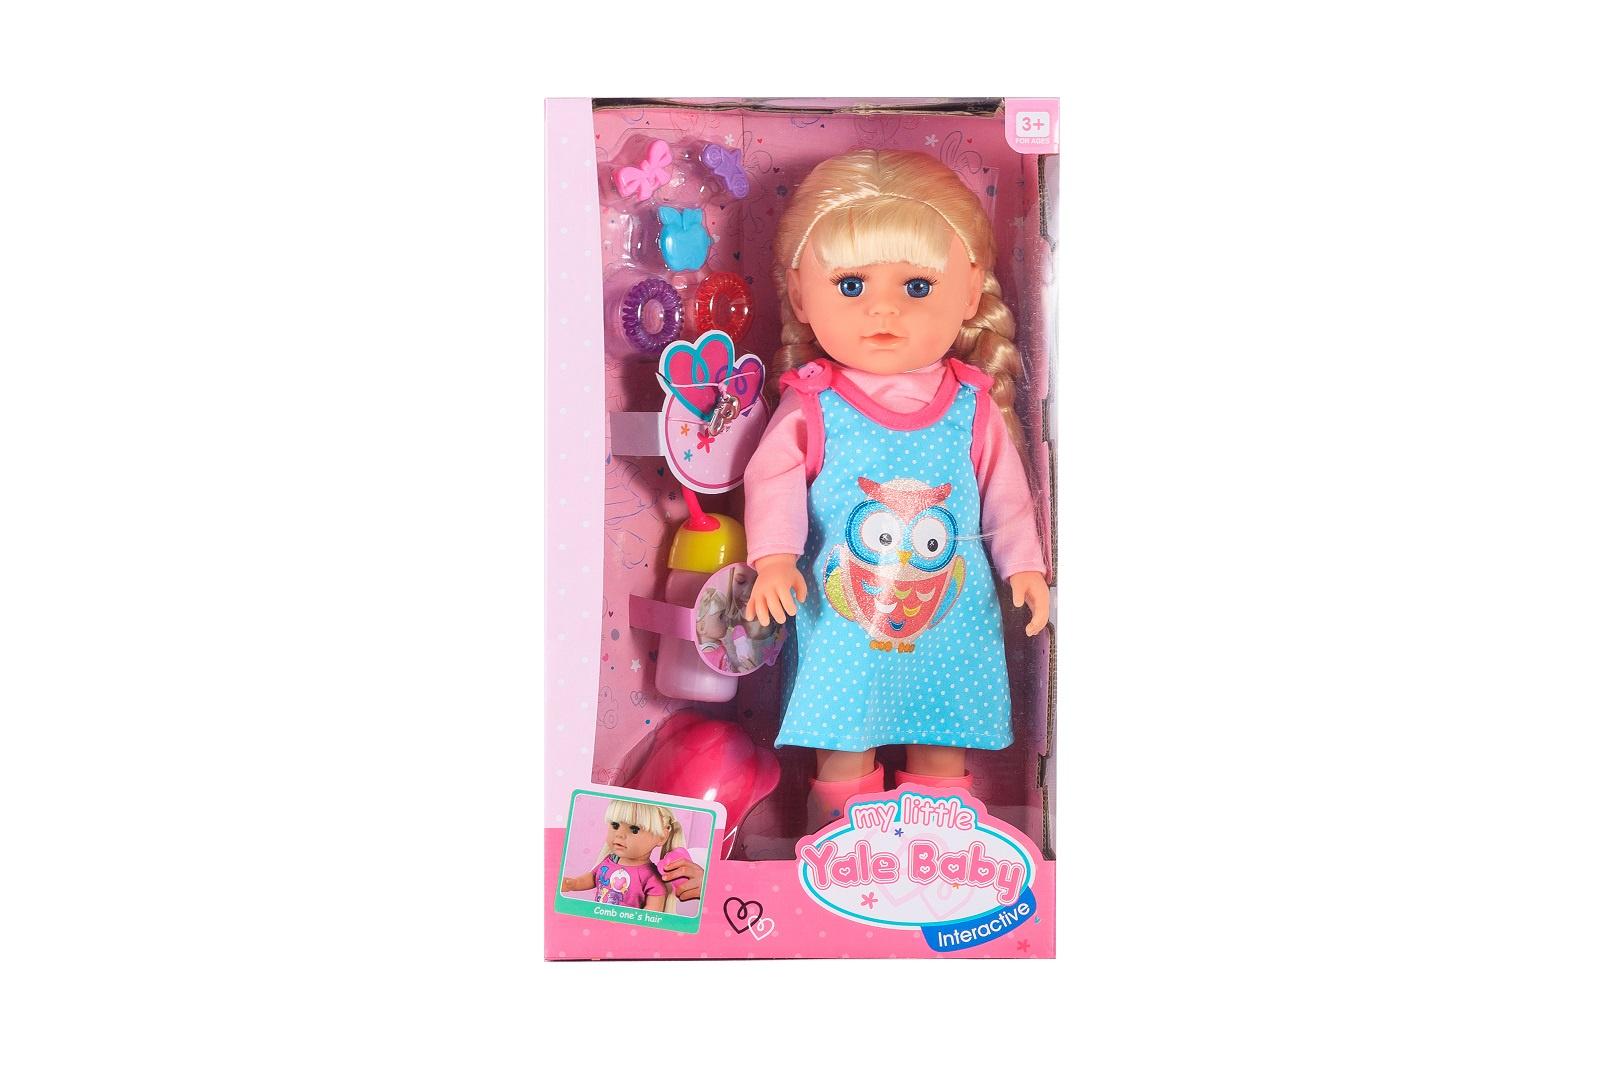 Кукла функциональная S+S Sister с аксессуарами, 200035535 кукла s s toys 1025 doll